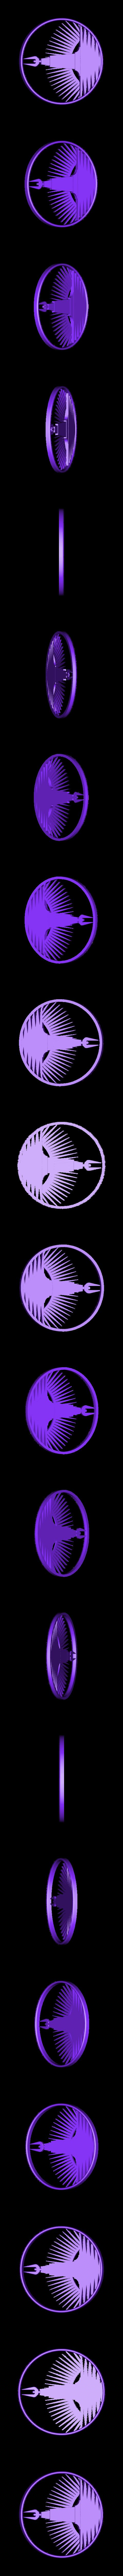 bio_logo.stl Download free STL file Bioshock pistol parts • 3D printable model, caramellcube